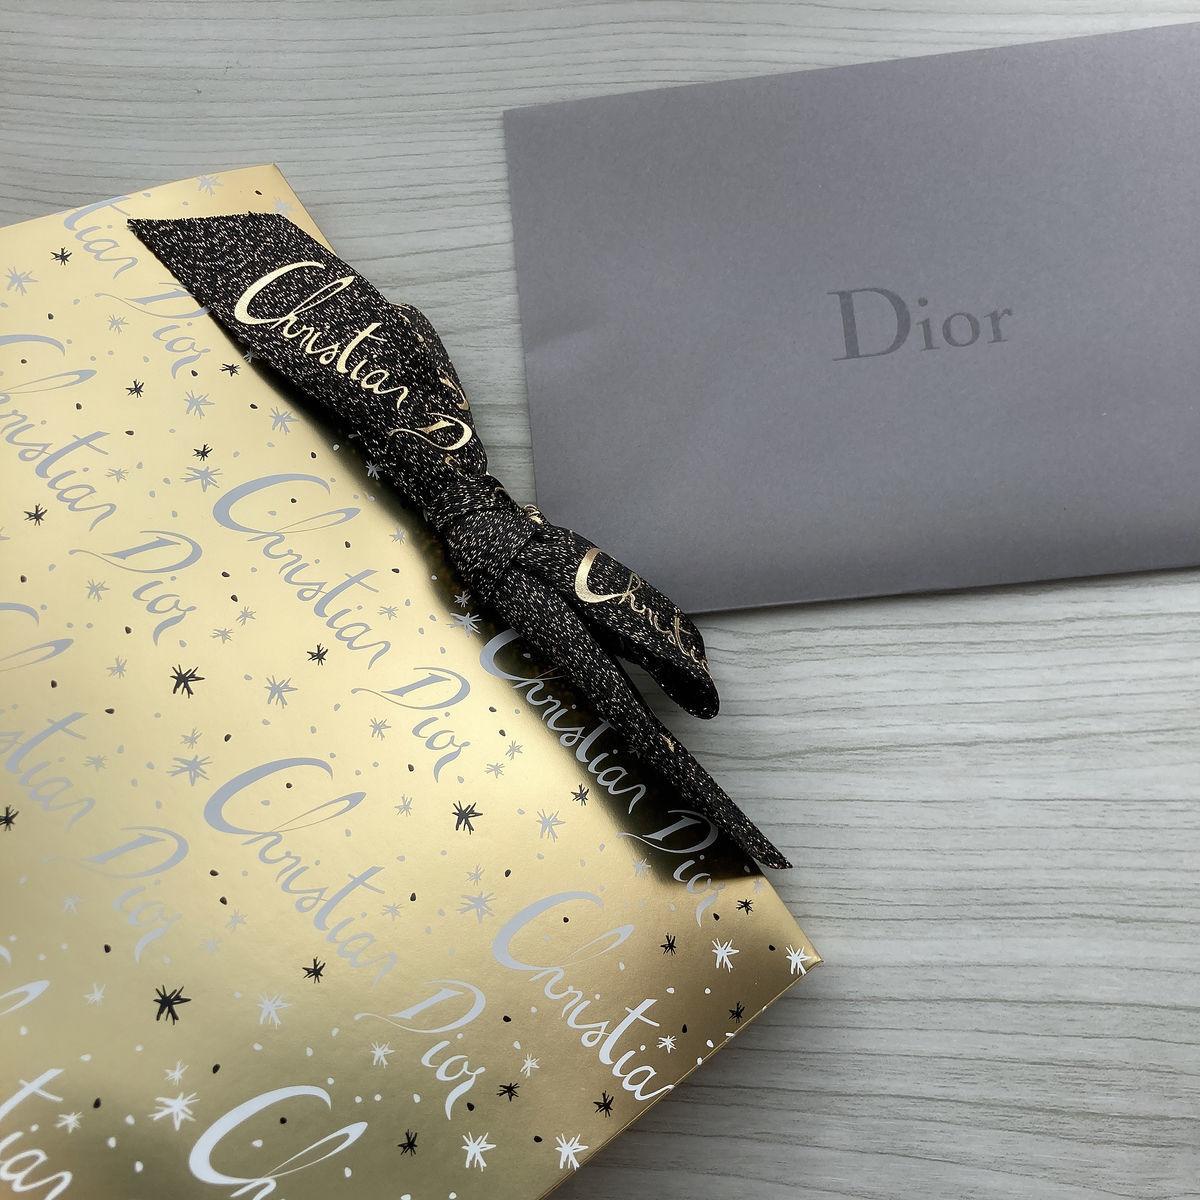 Dior 限定 パッケージ